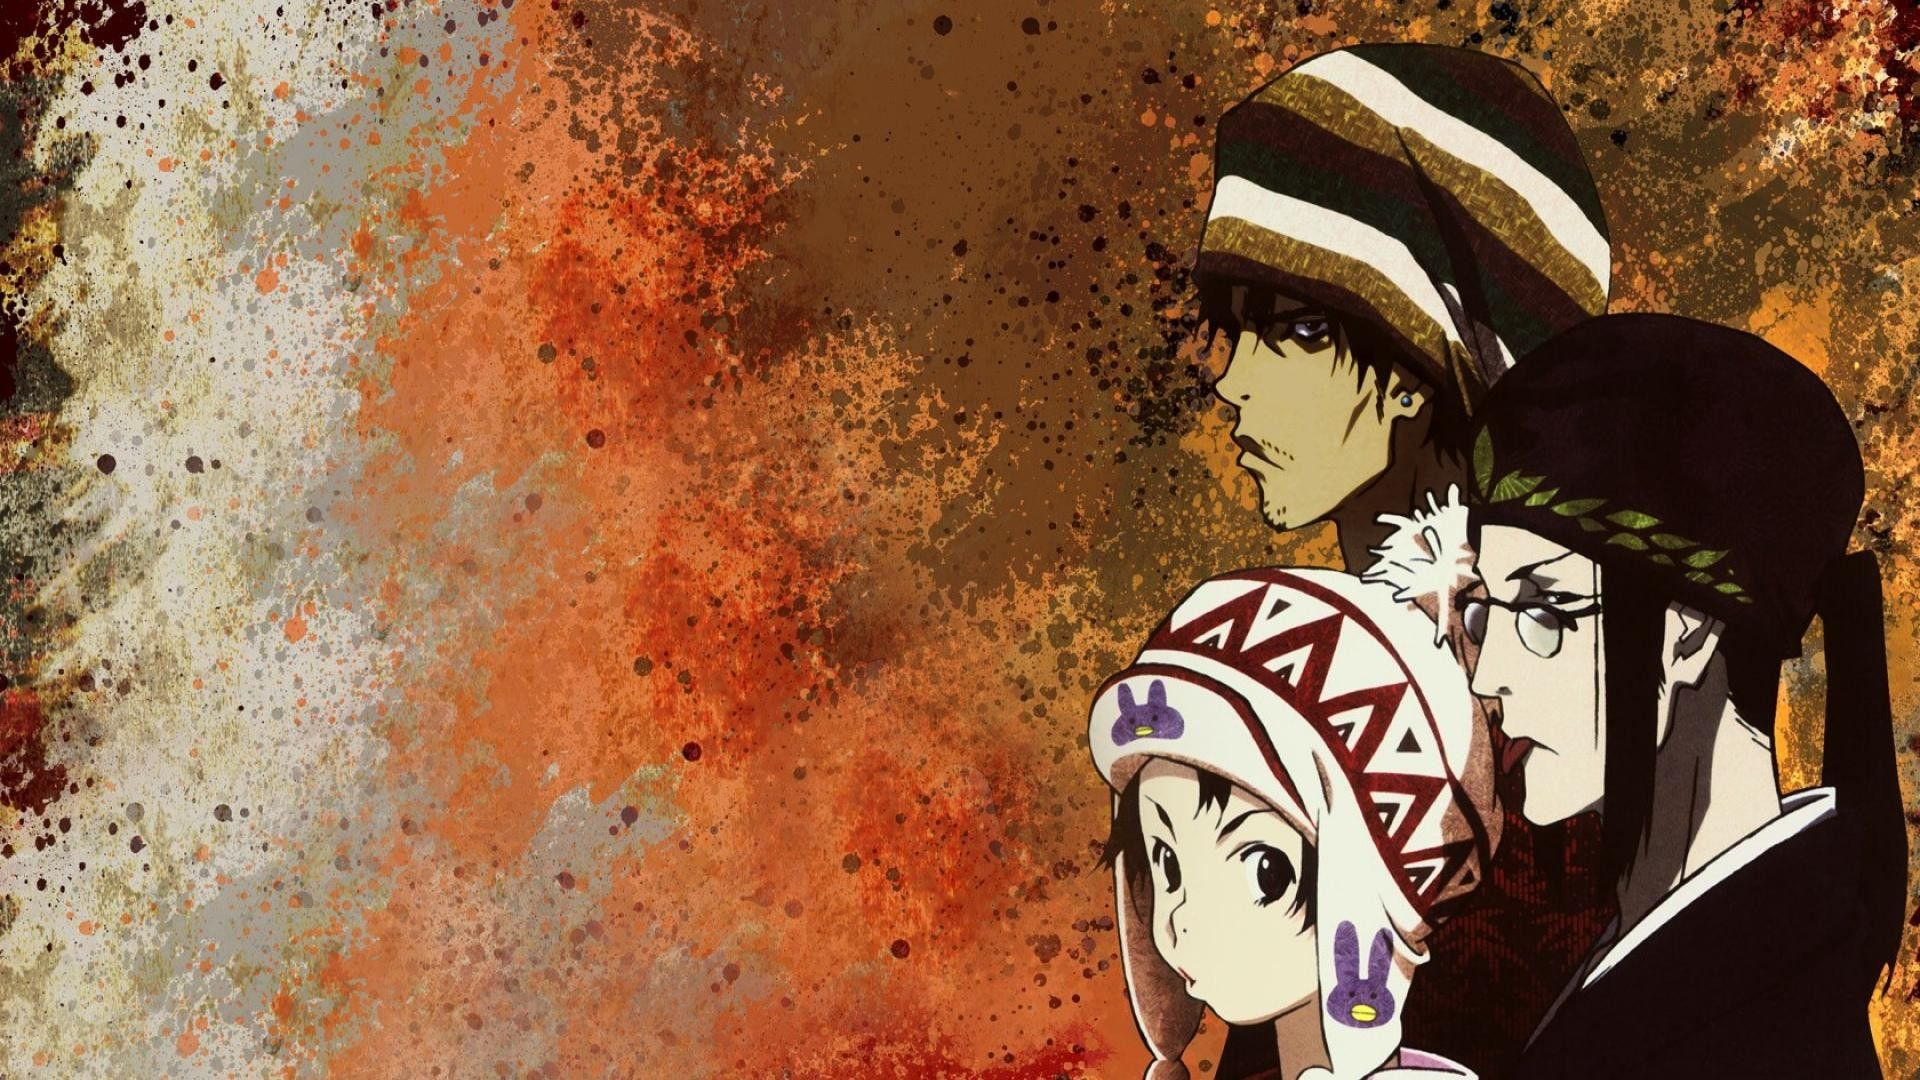 1920x1080 Samurai Champloo Wallpaper Widescreen Anime